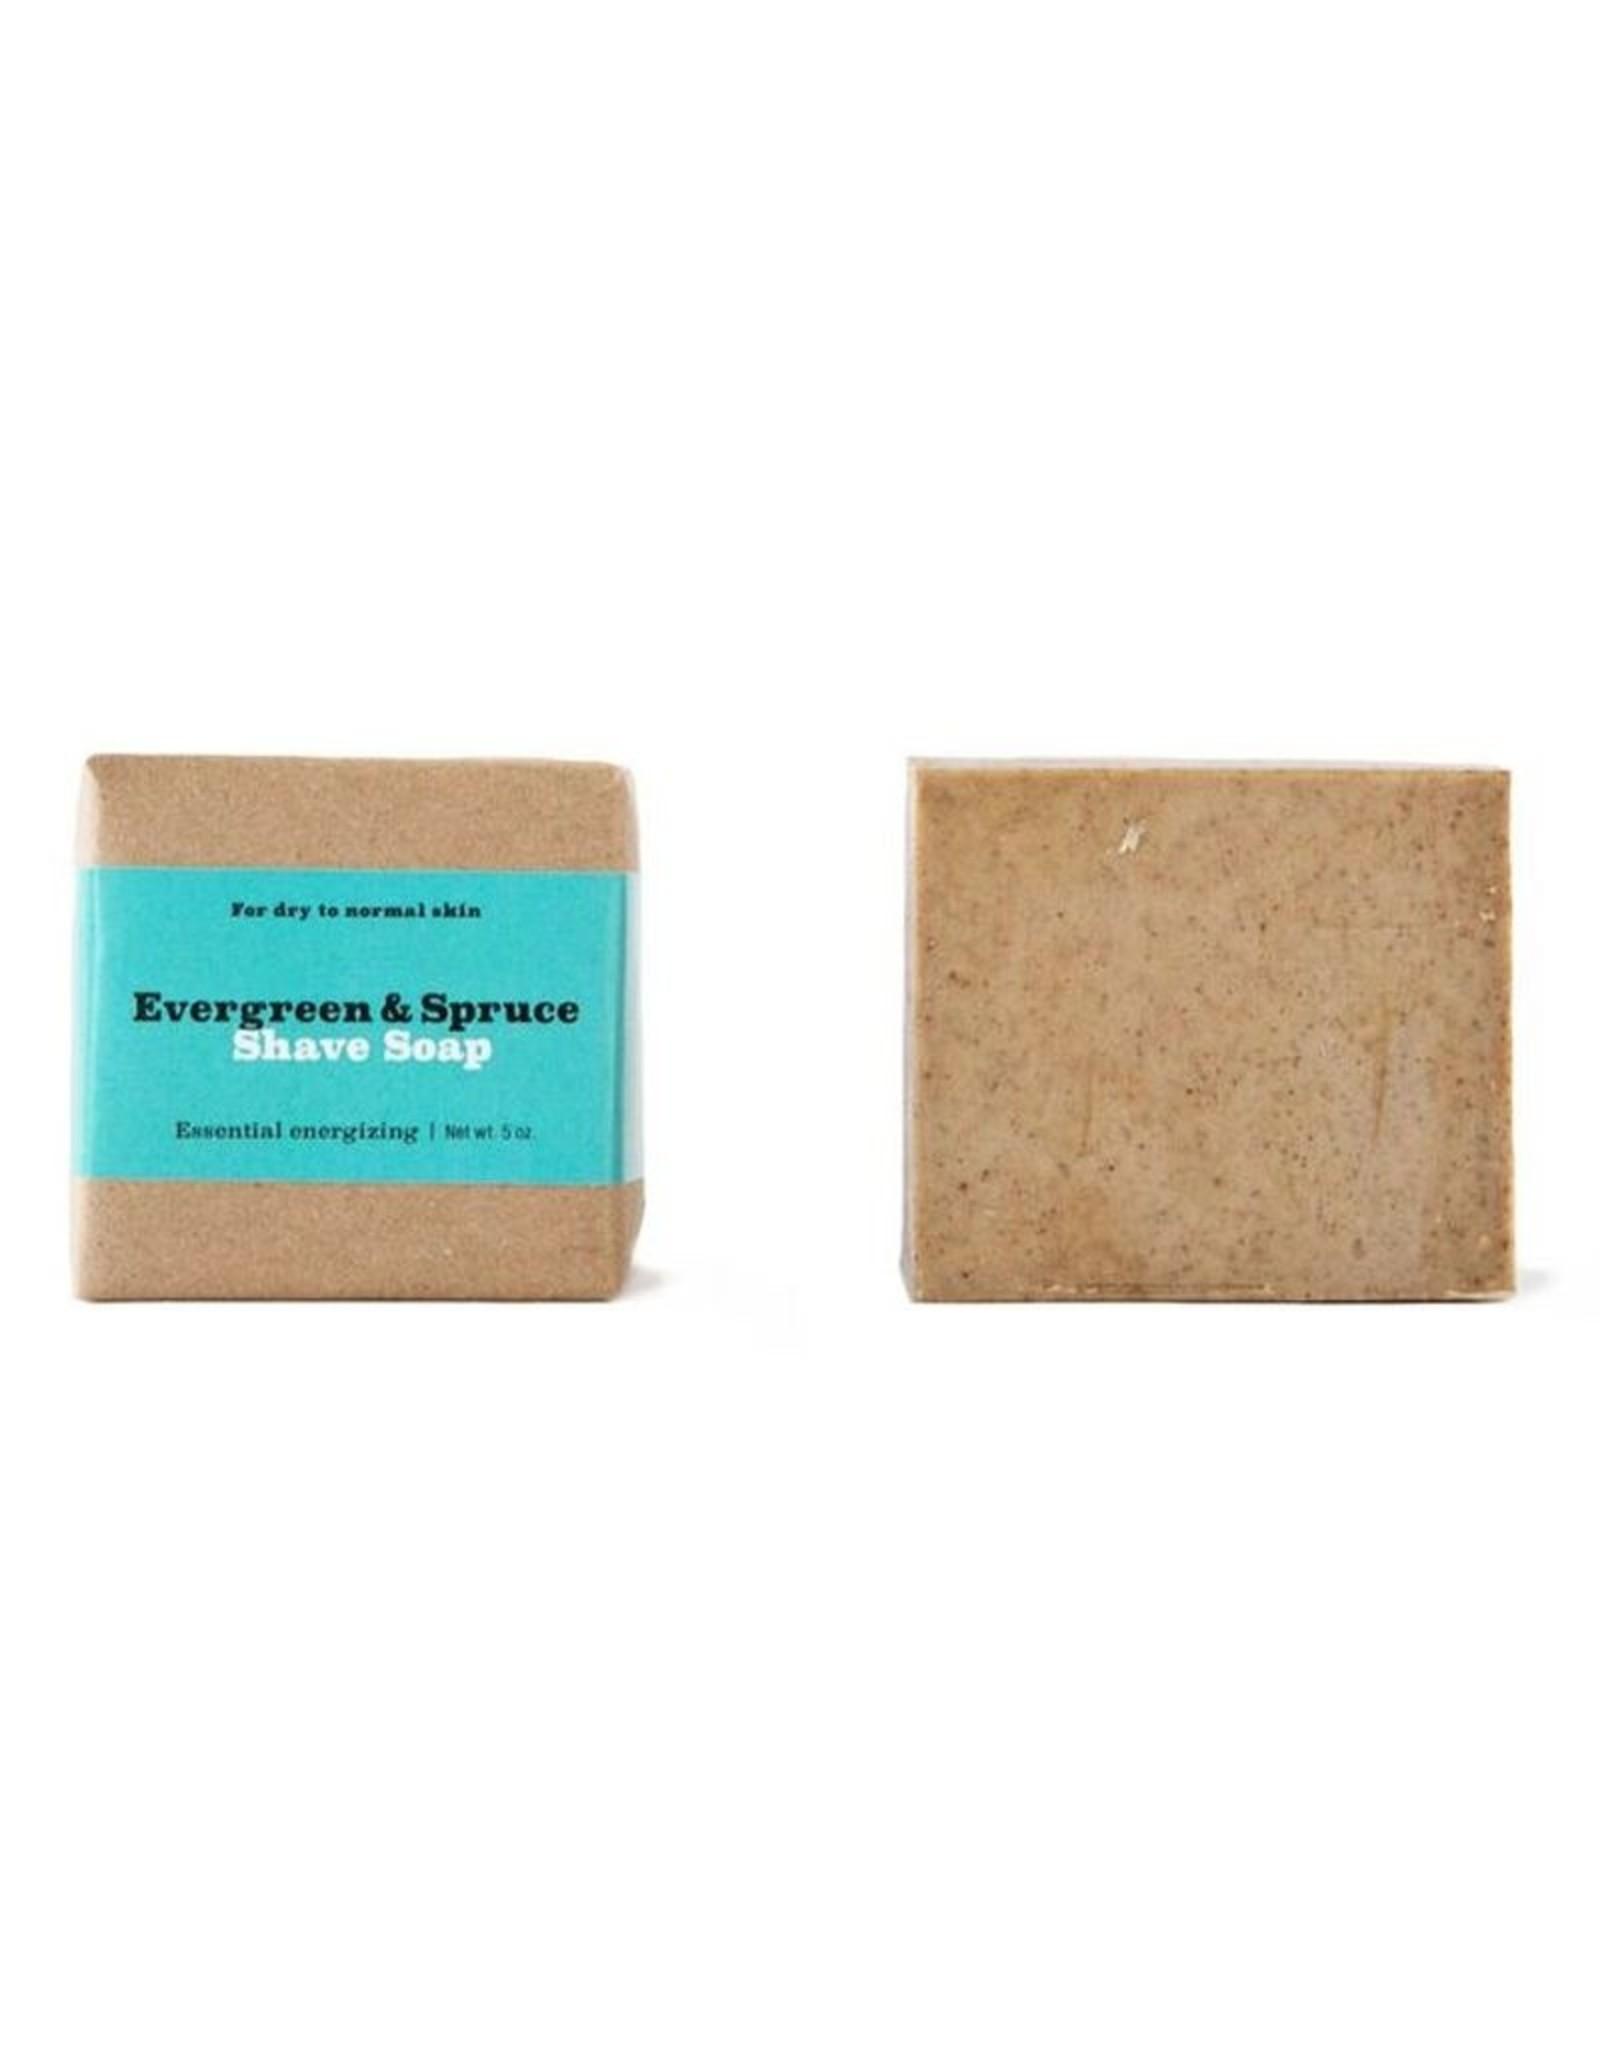 Sallye Ander Evergreen Essential Soap